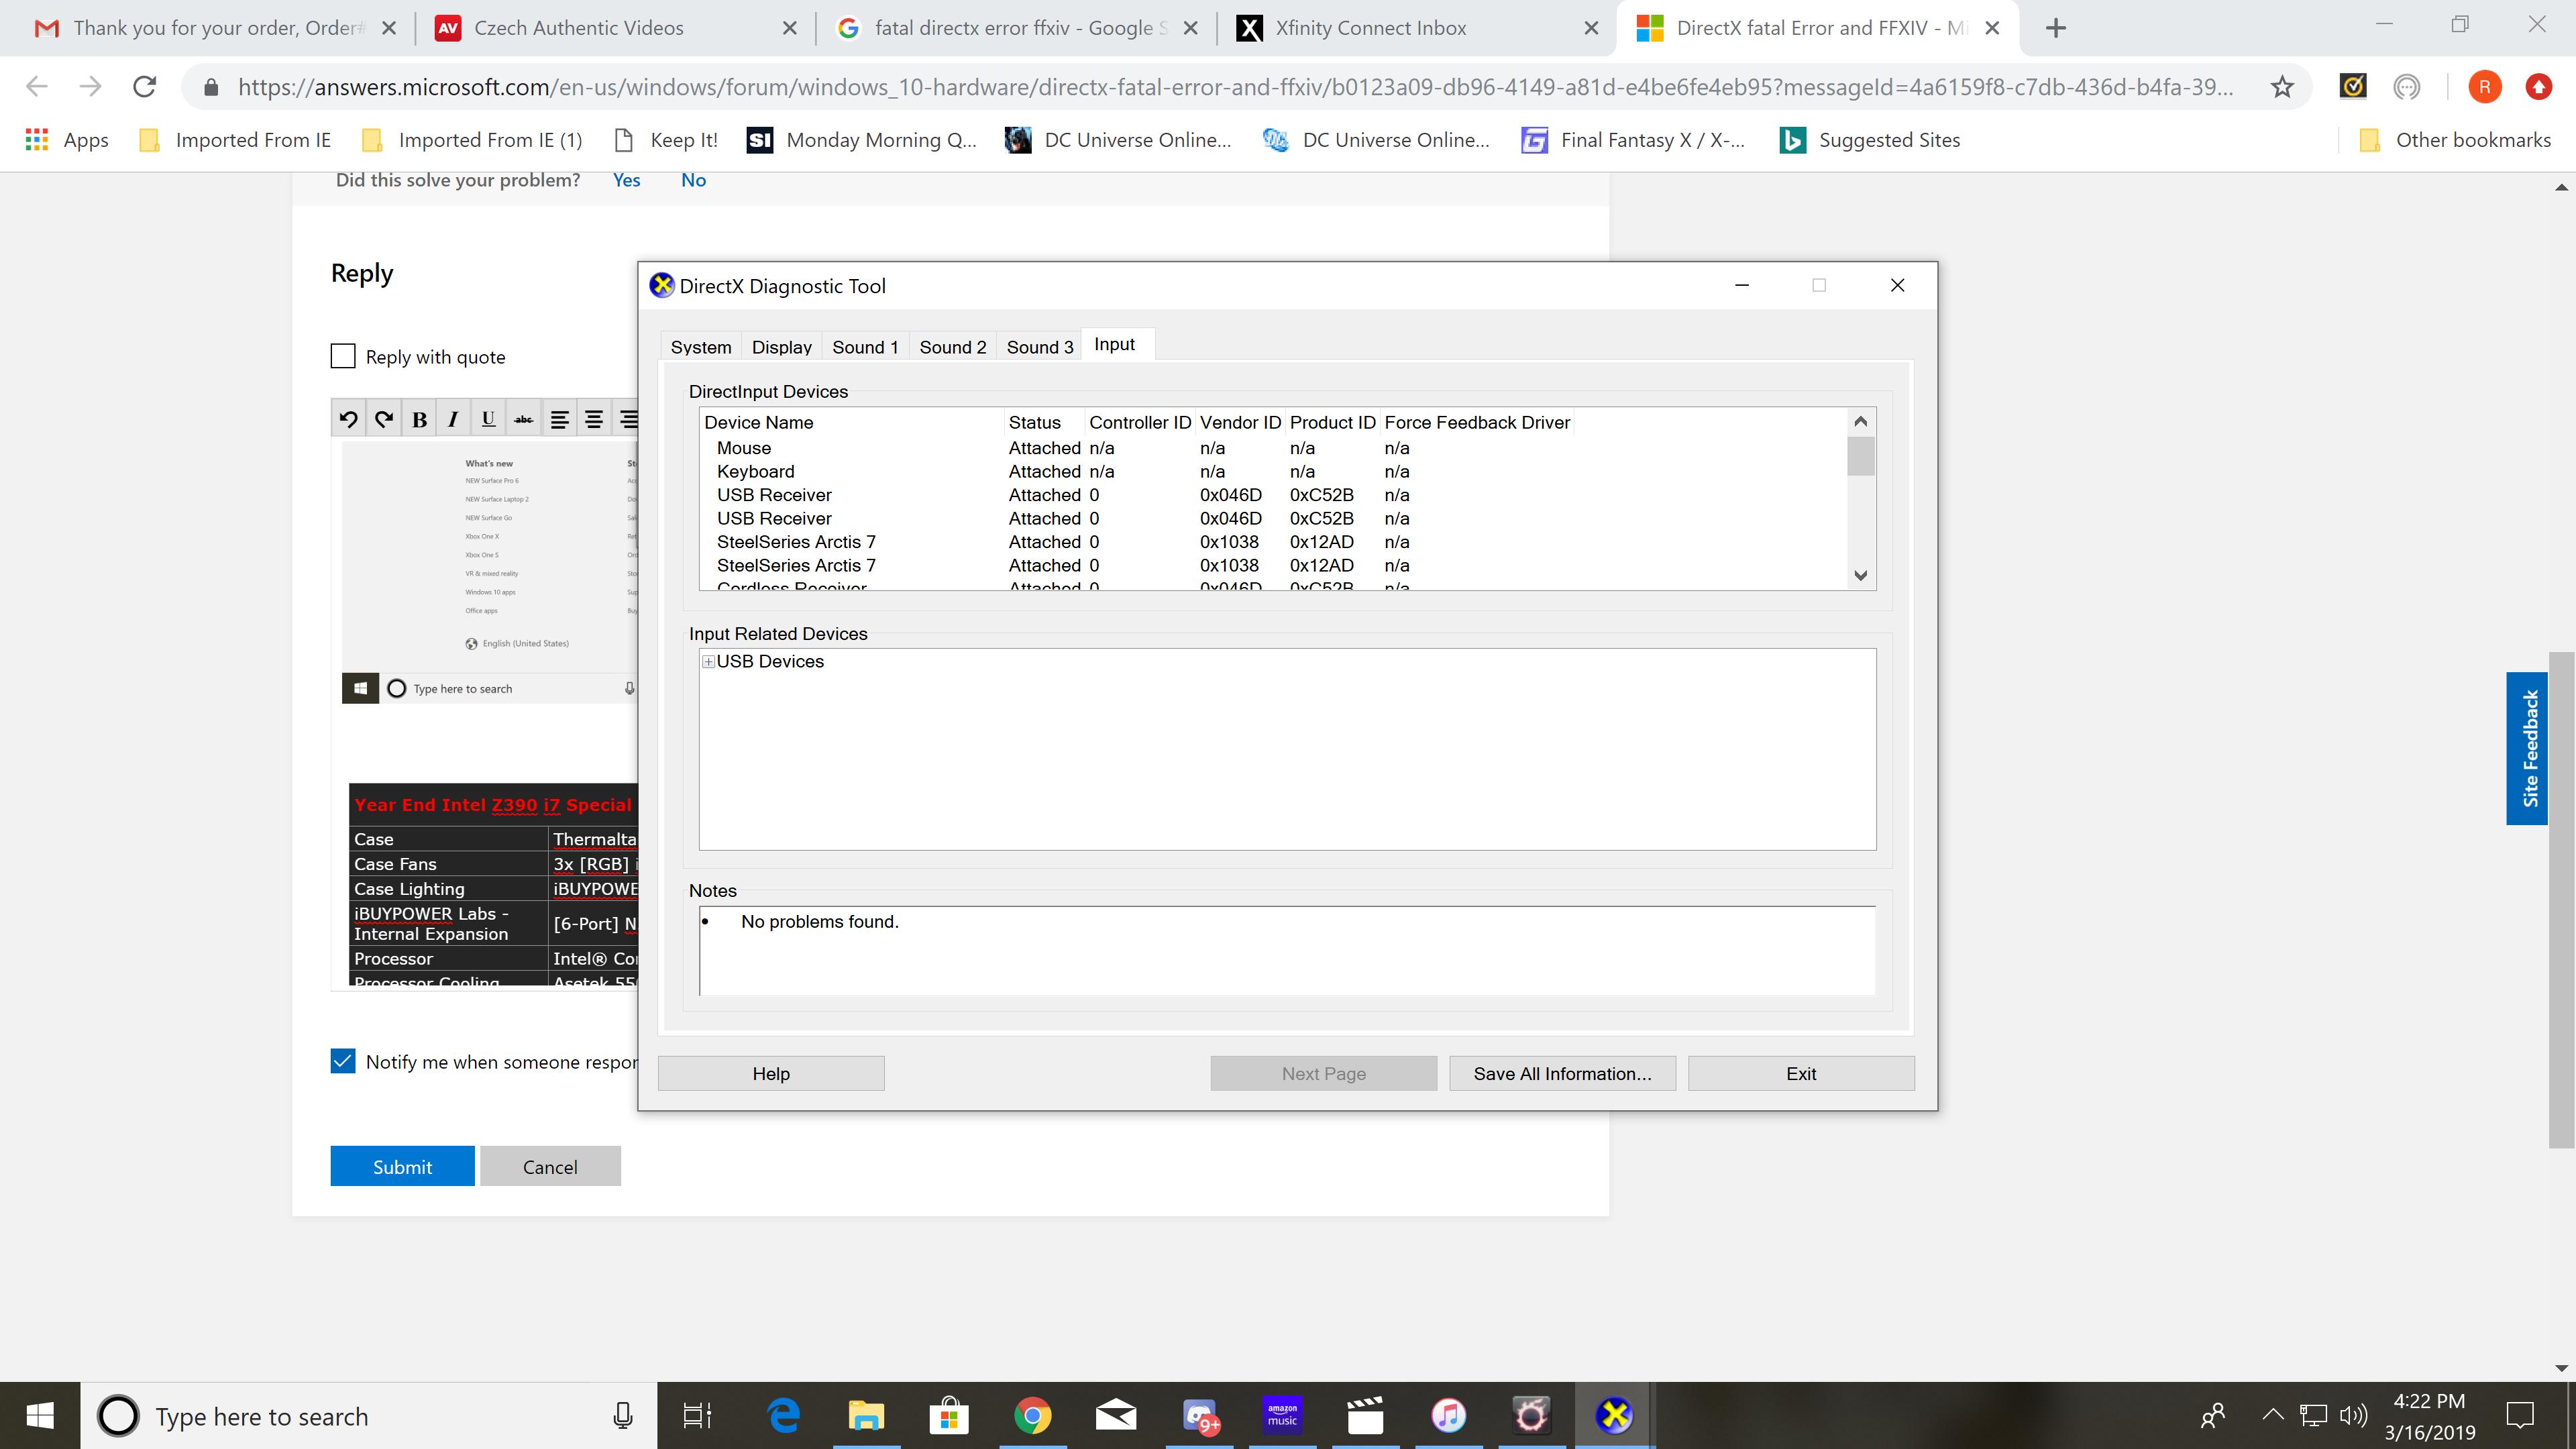 DirectX fatal Error and FFXIV - Microsoft Community